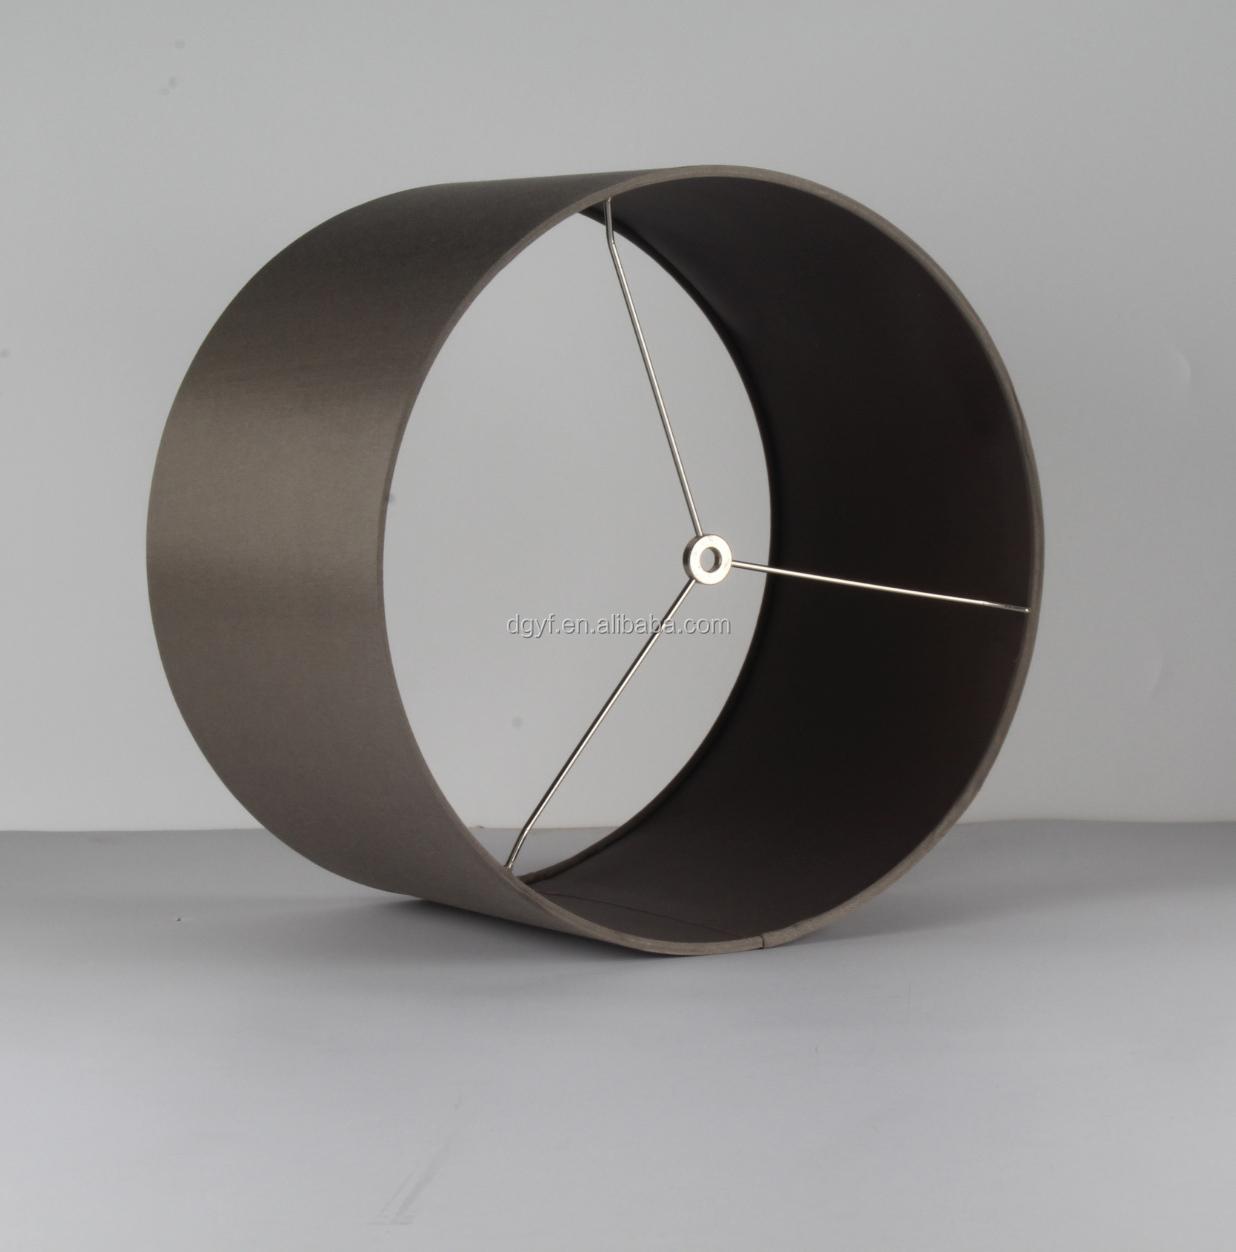 Bett dekoration schwarz stoff pvc handwerk 10 zoll trommel lampe ...